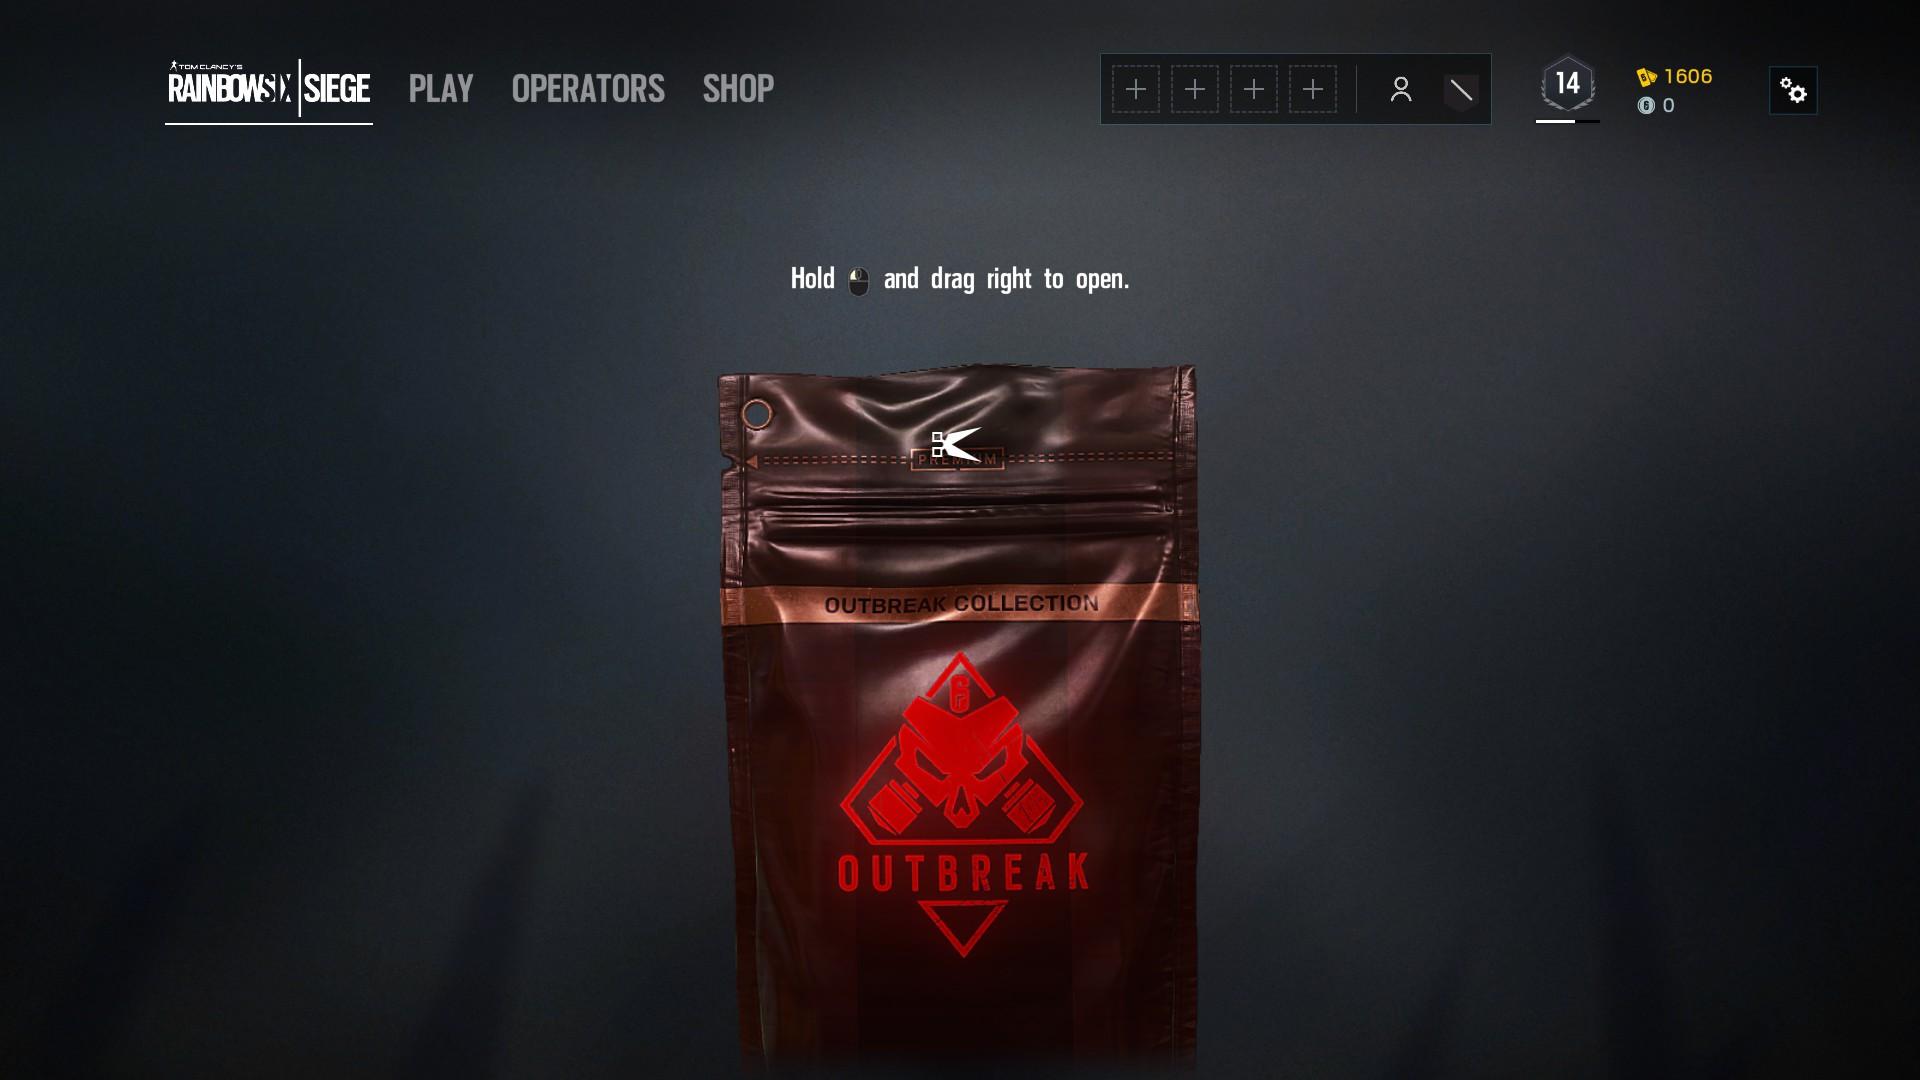 How to Get Outbreak Packs in Rainbow Six Siege | Shacknews